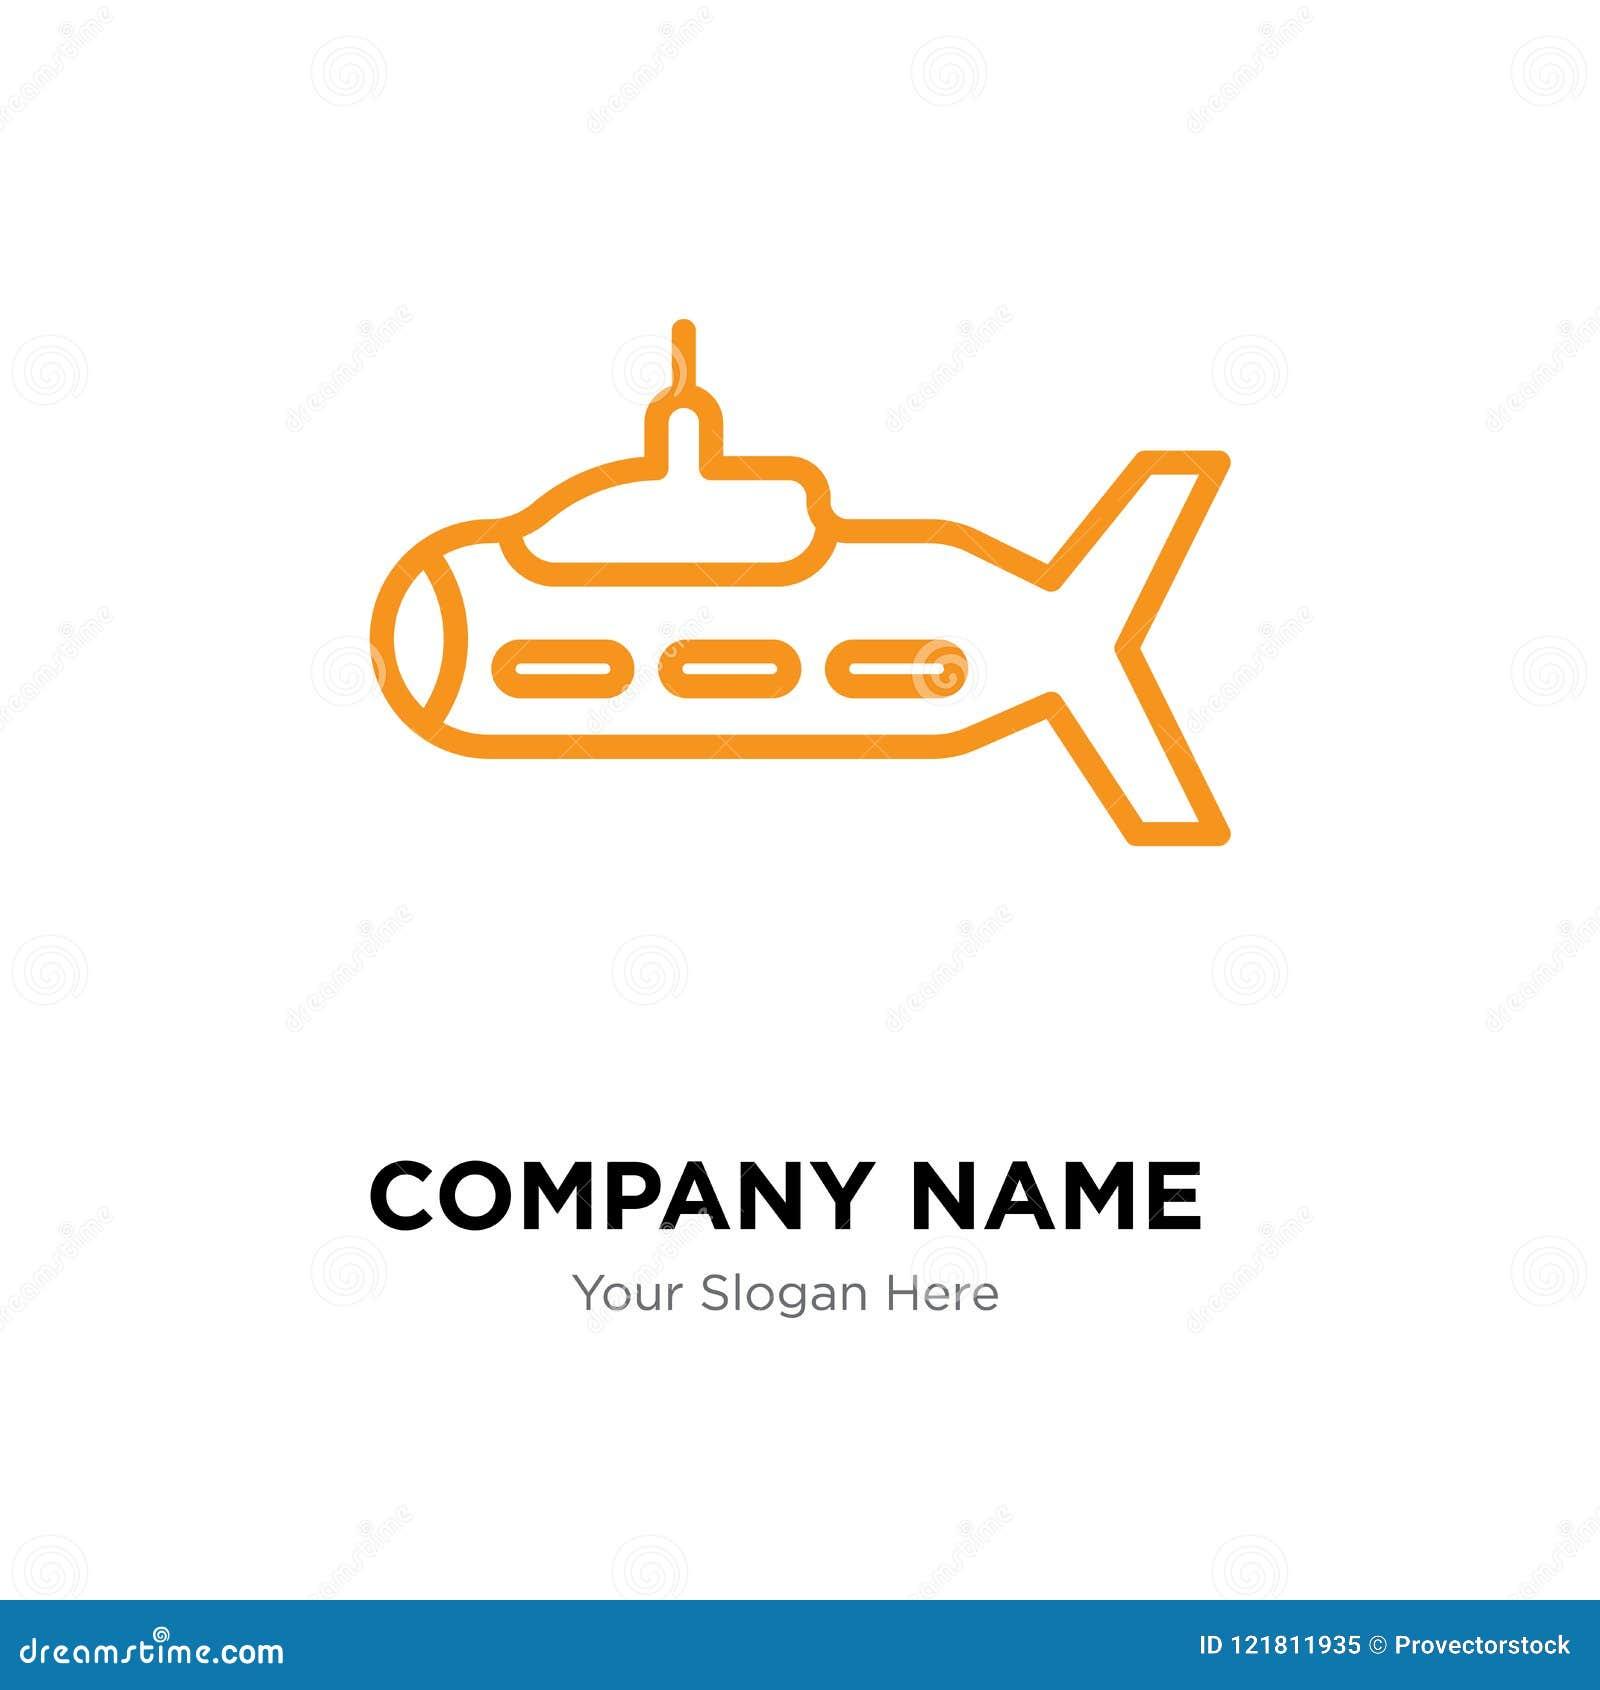 submarine company logo design stock vector illustration of